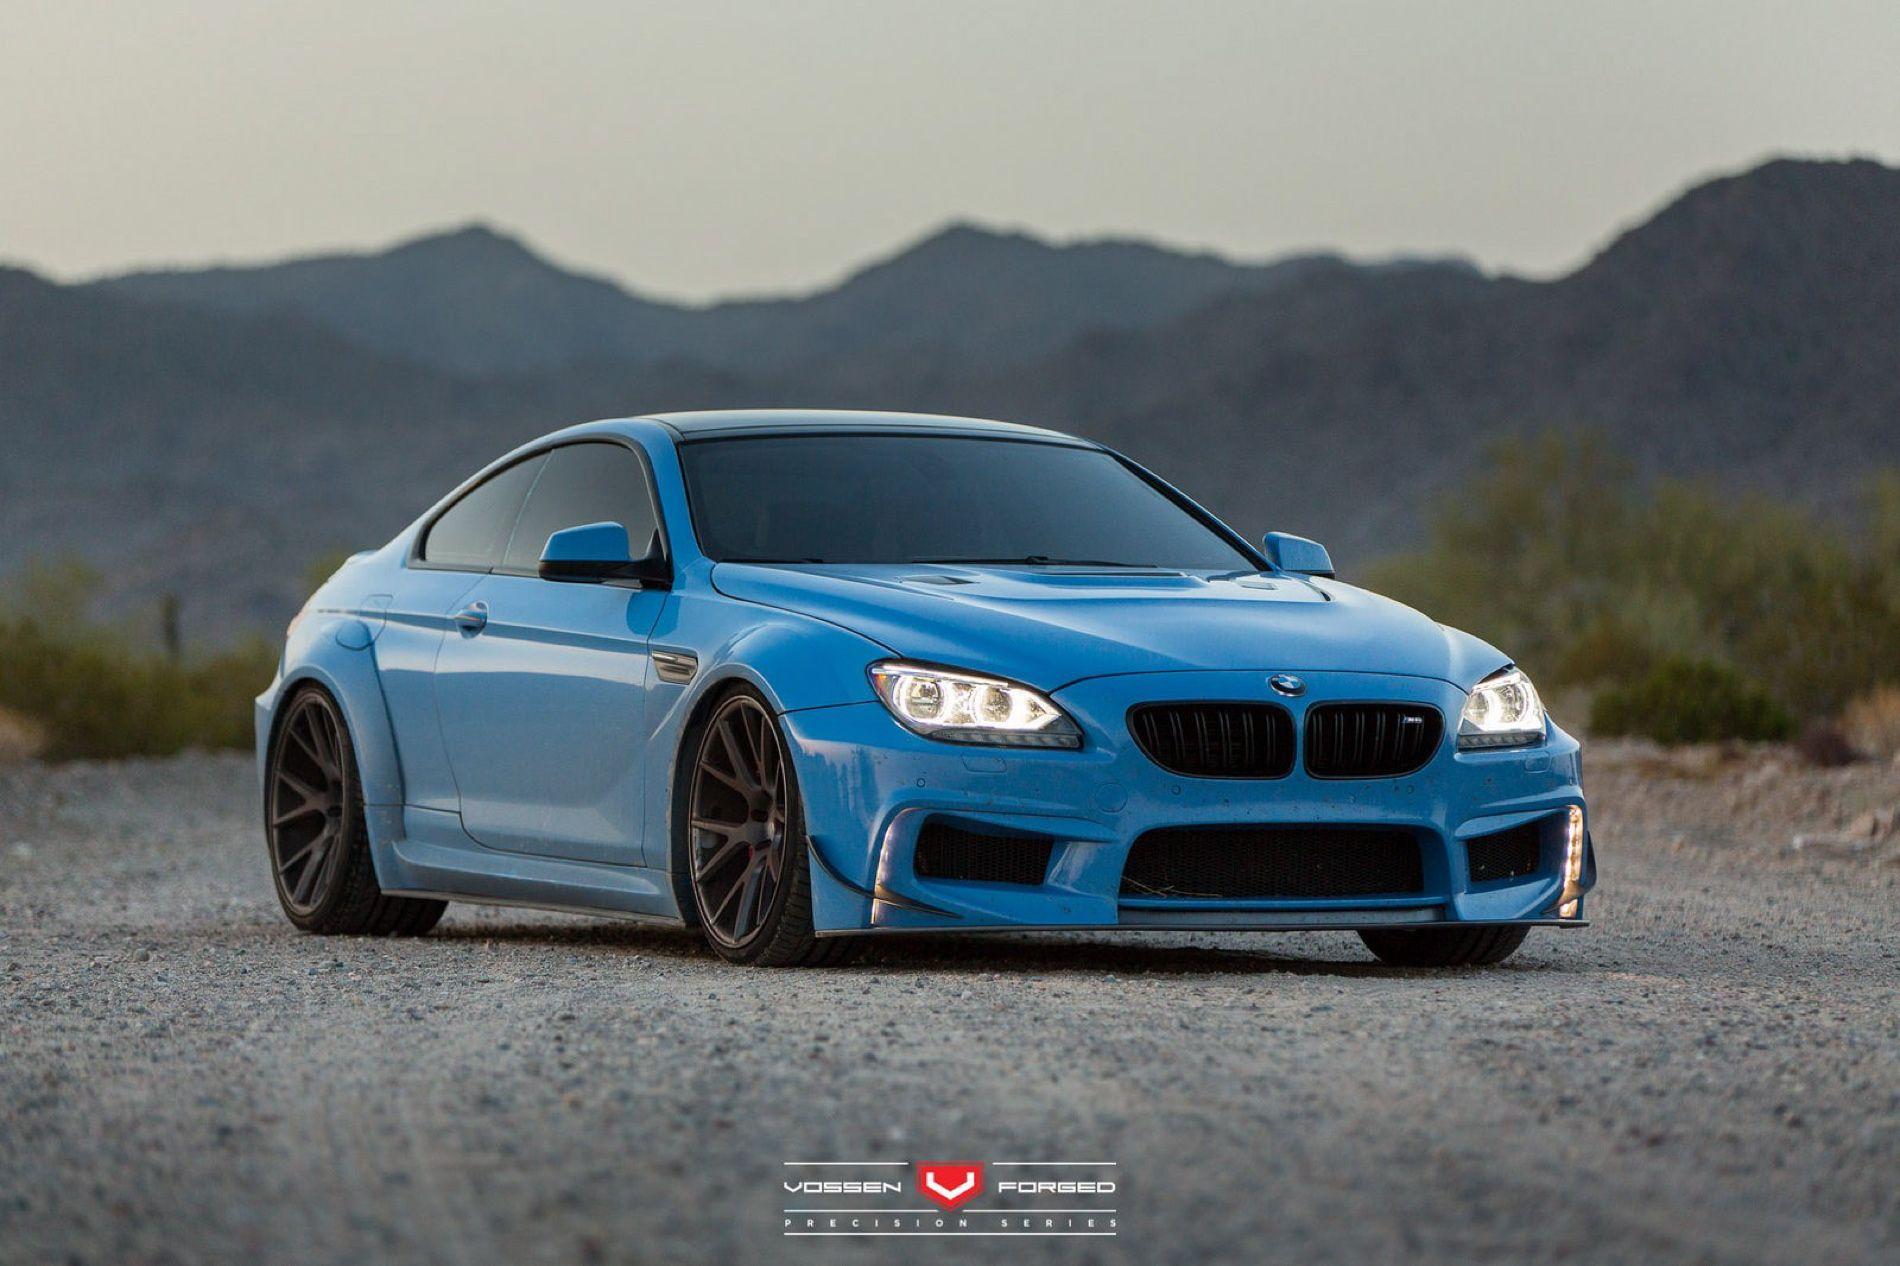 2013 bmw 650i gran coupe review BMW Pinterest